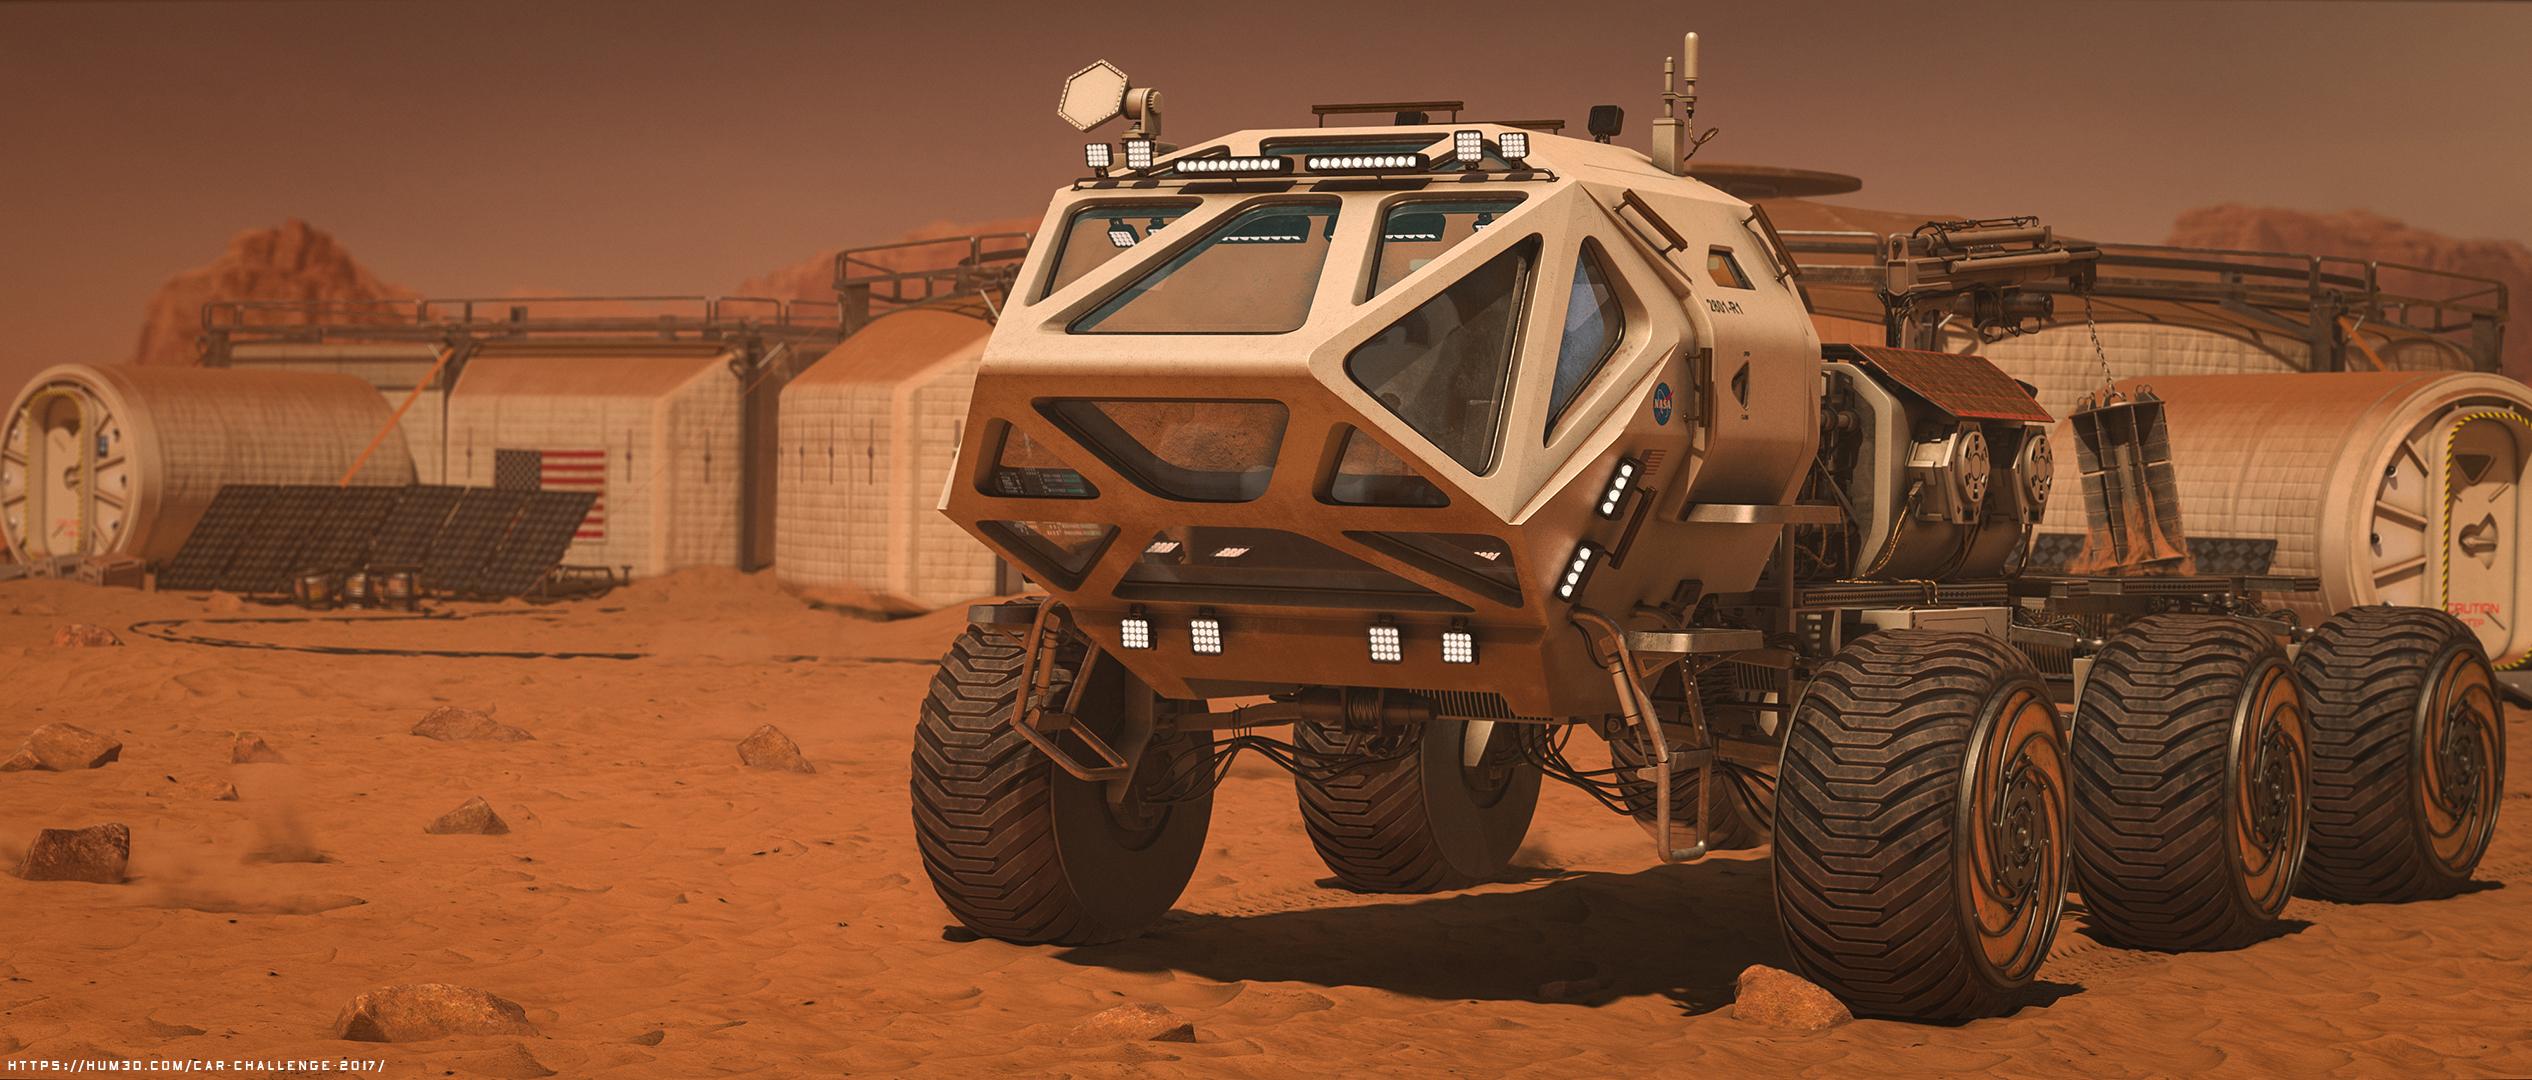 The Martian Rover 3d art